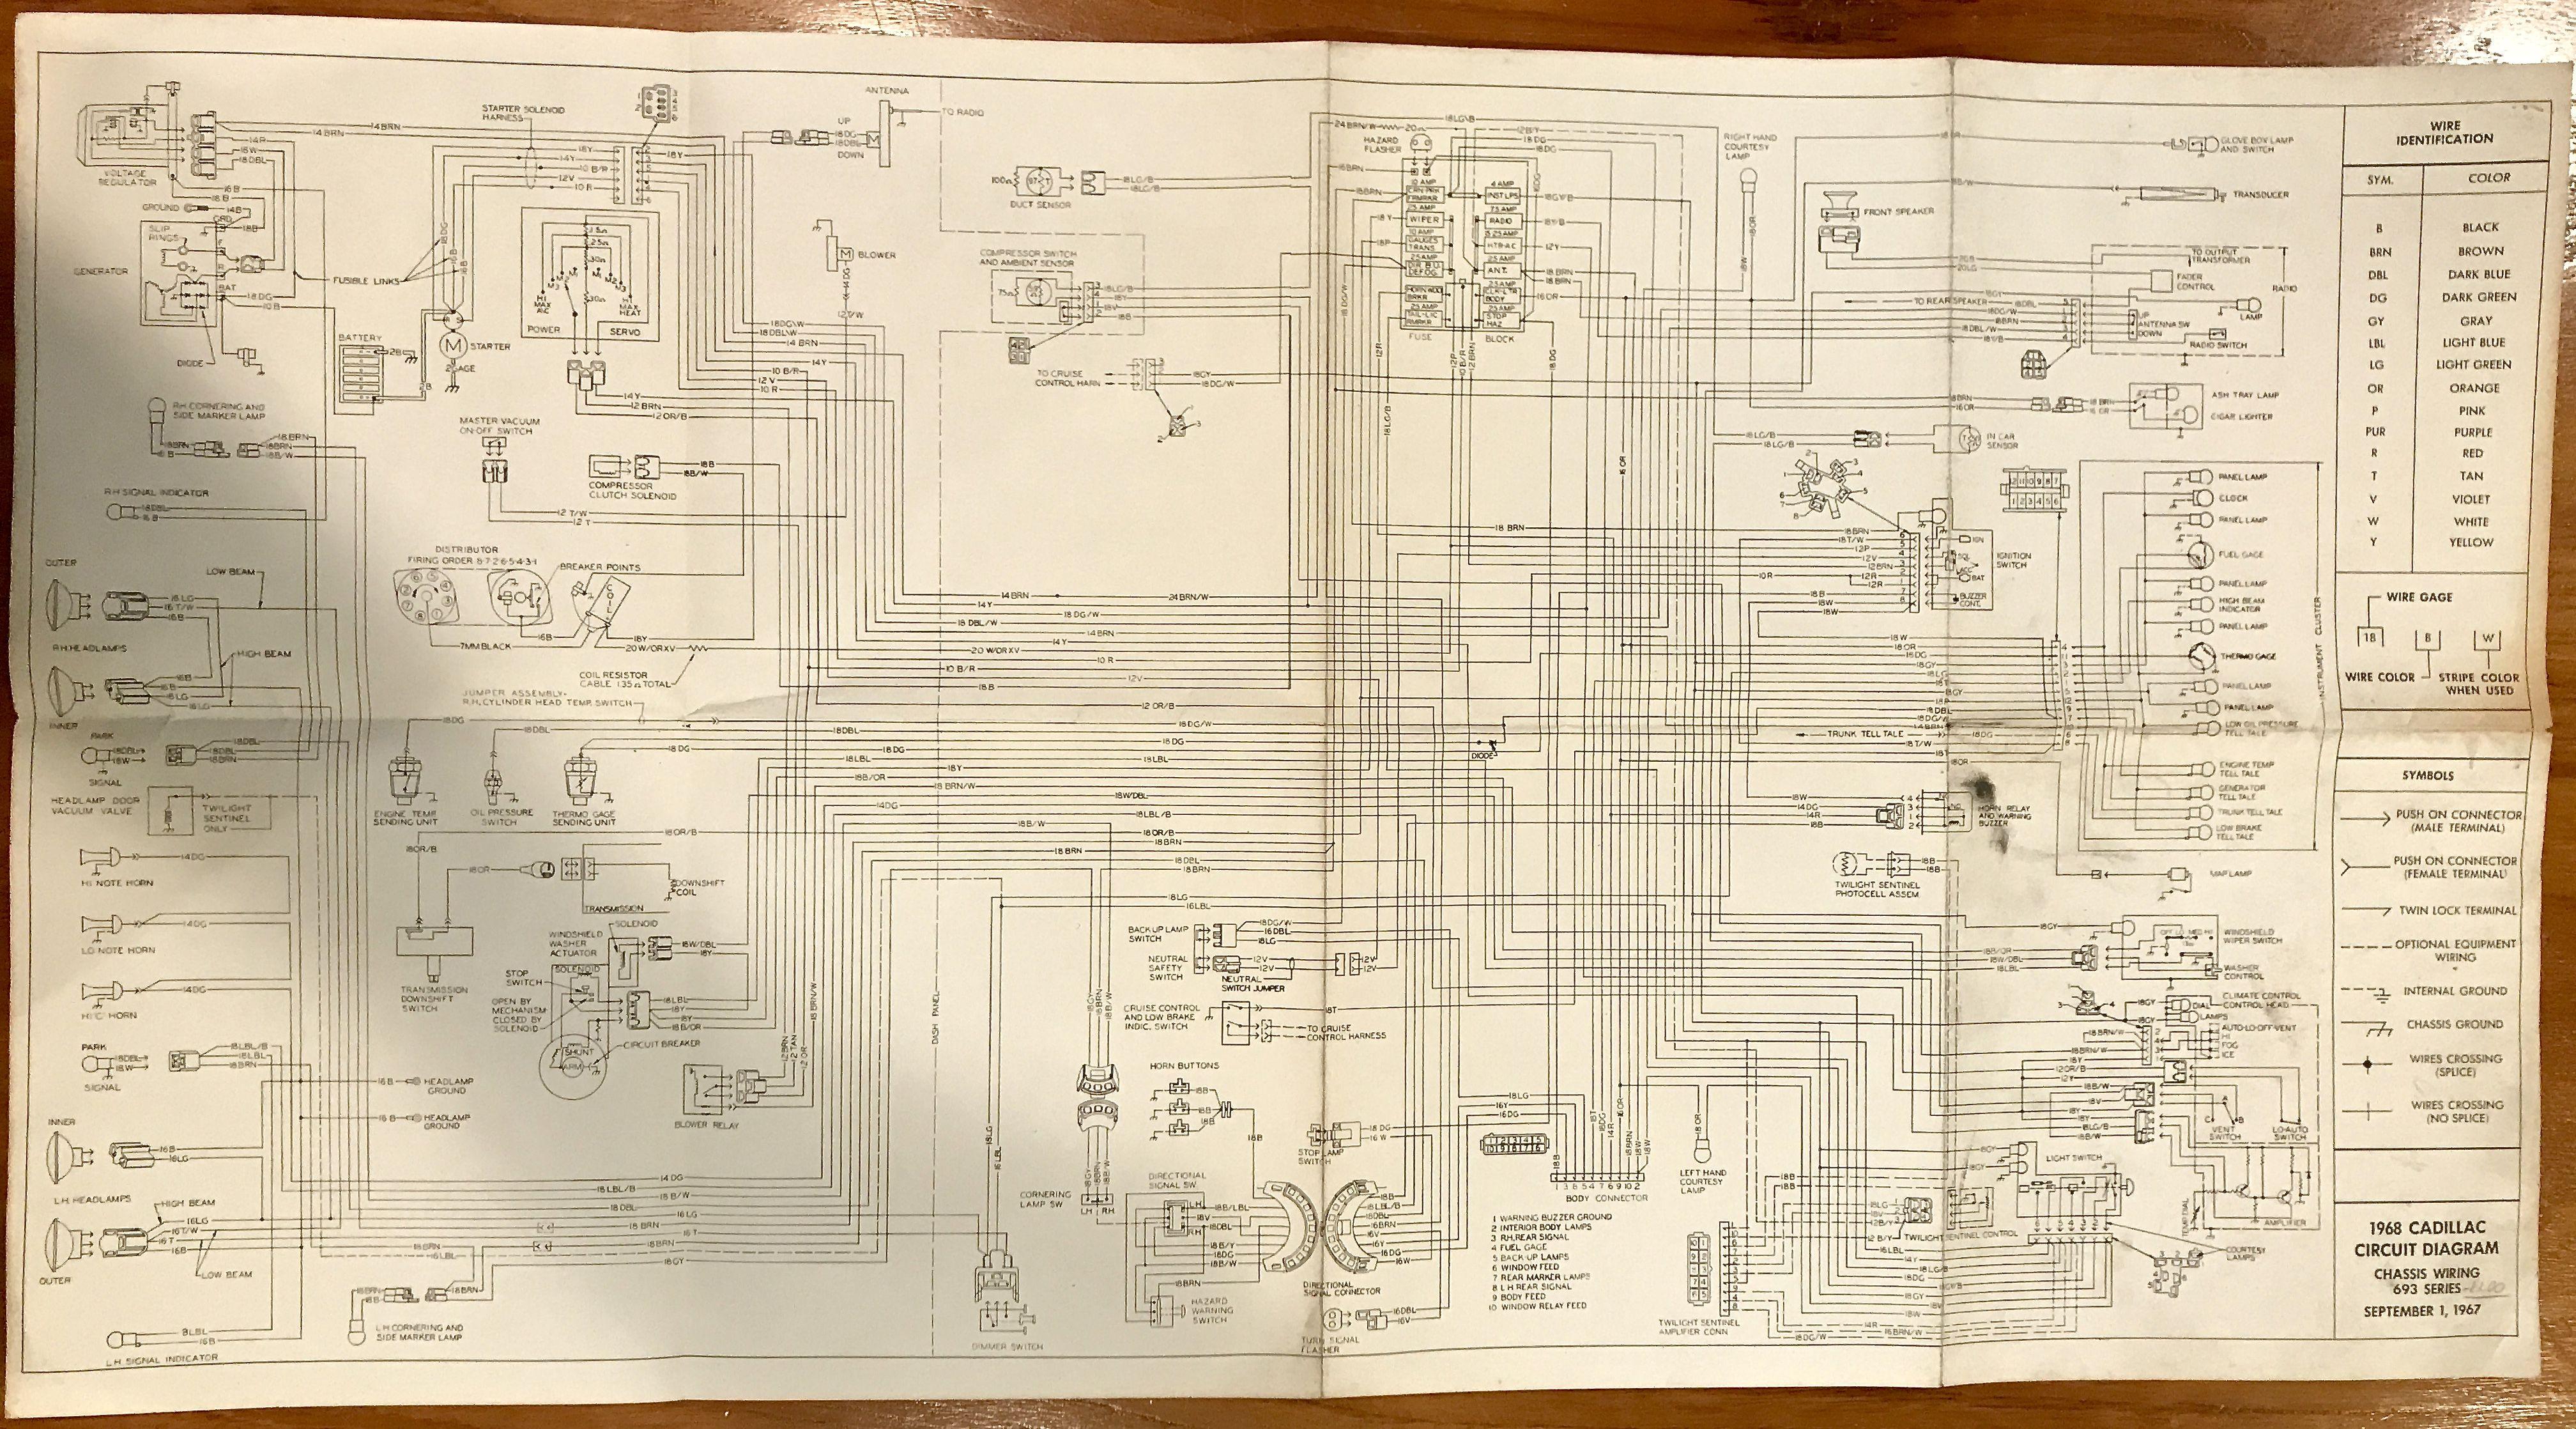 1968 cadillac wiring circuit diagram cars circuit diagram 1968 cadillac wiring diagram 1968 cadillac wiring circuit [ 4032 x 2236 Pixel ]